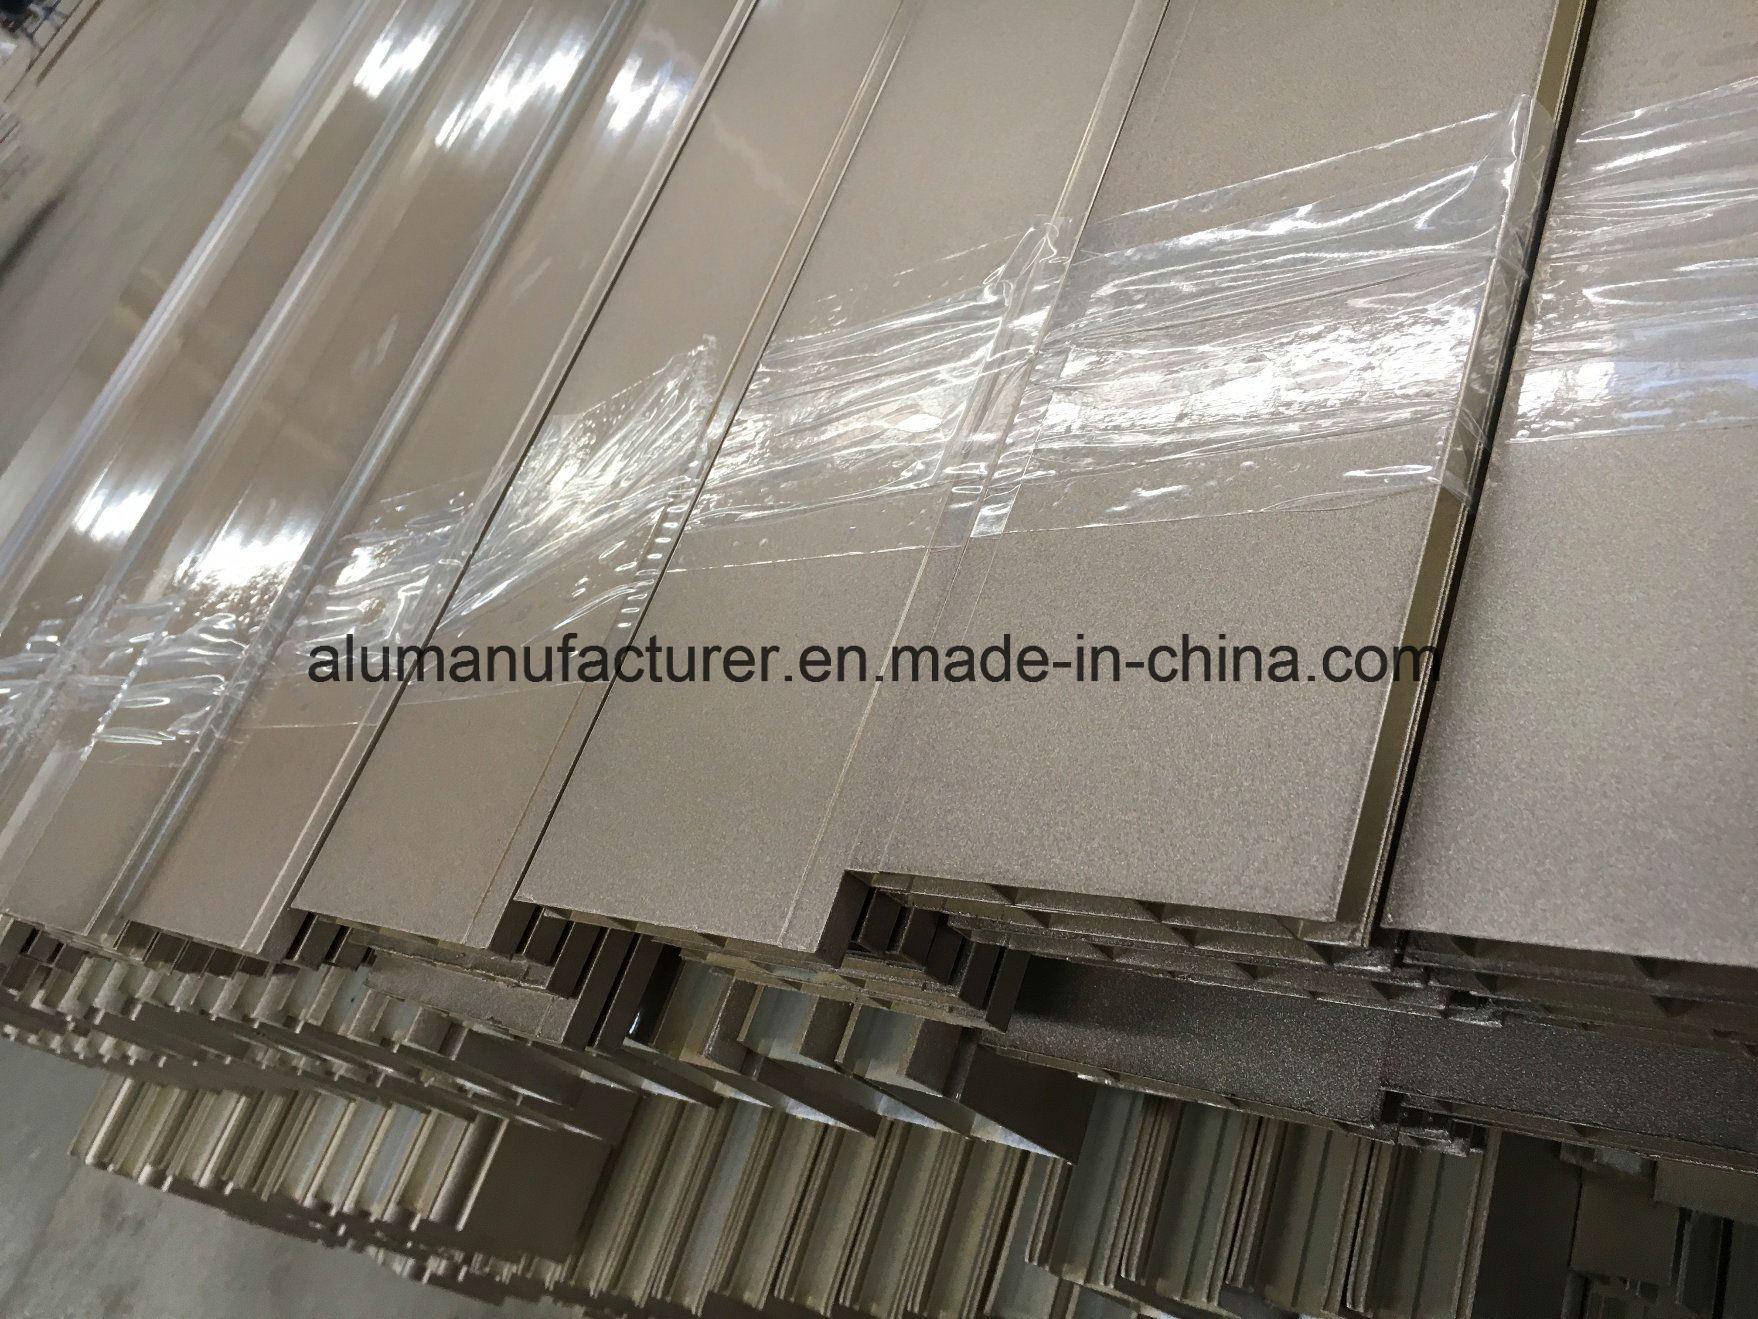 Metalic Powder Coated Aluminium Alloy Extrusion Profile for Door and Window